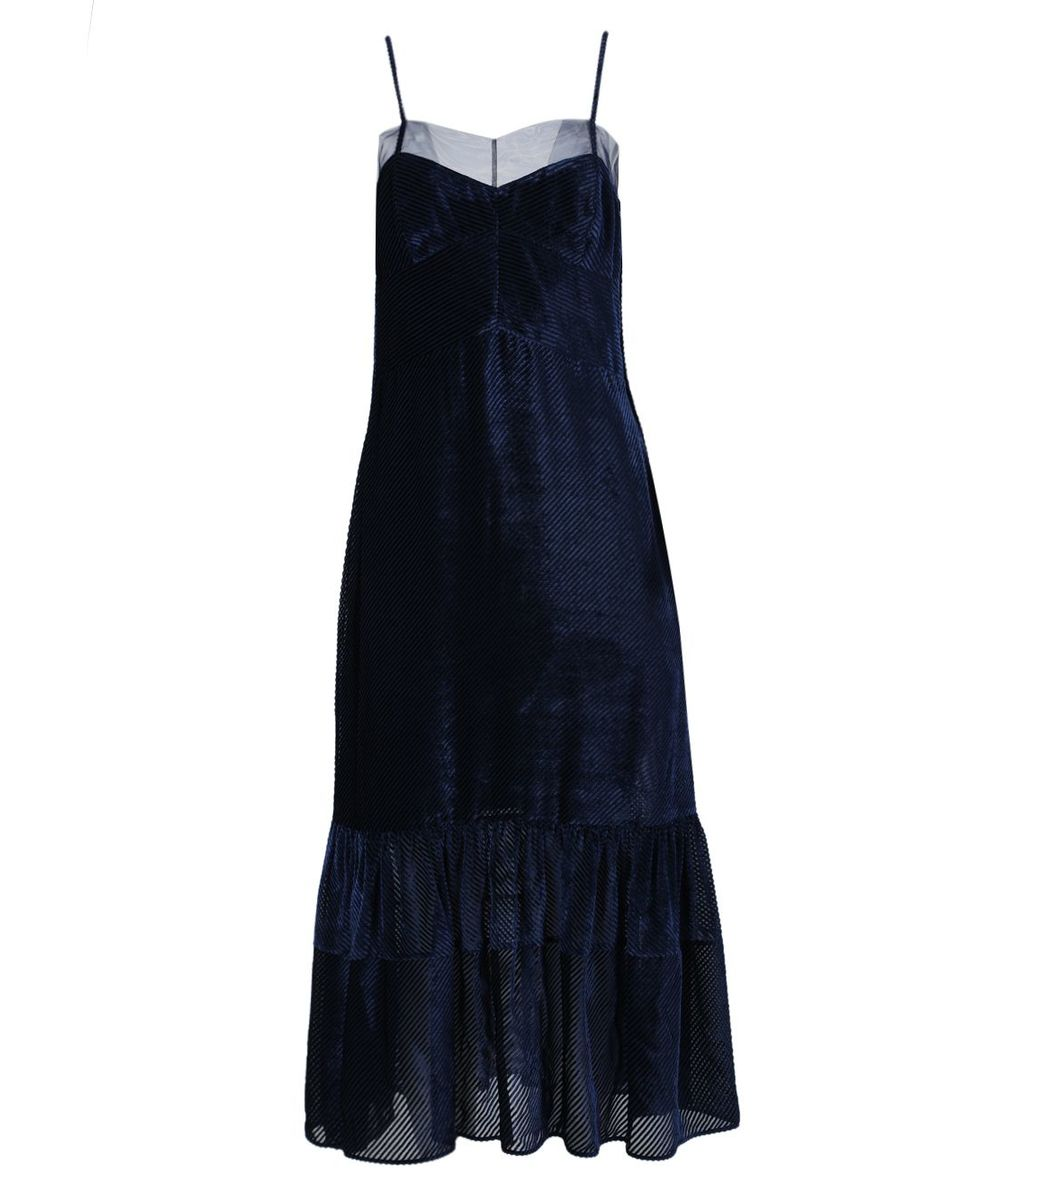 FENDI Blue Silk Corduroy Dress